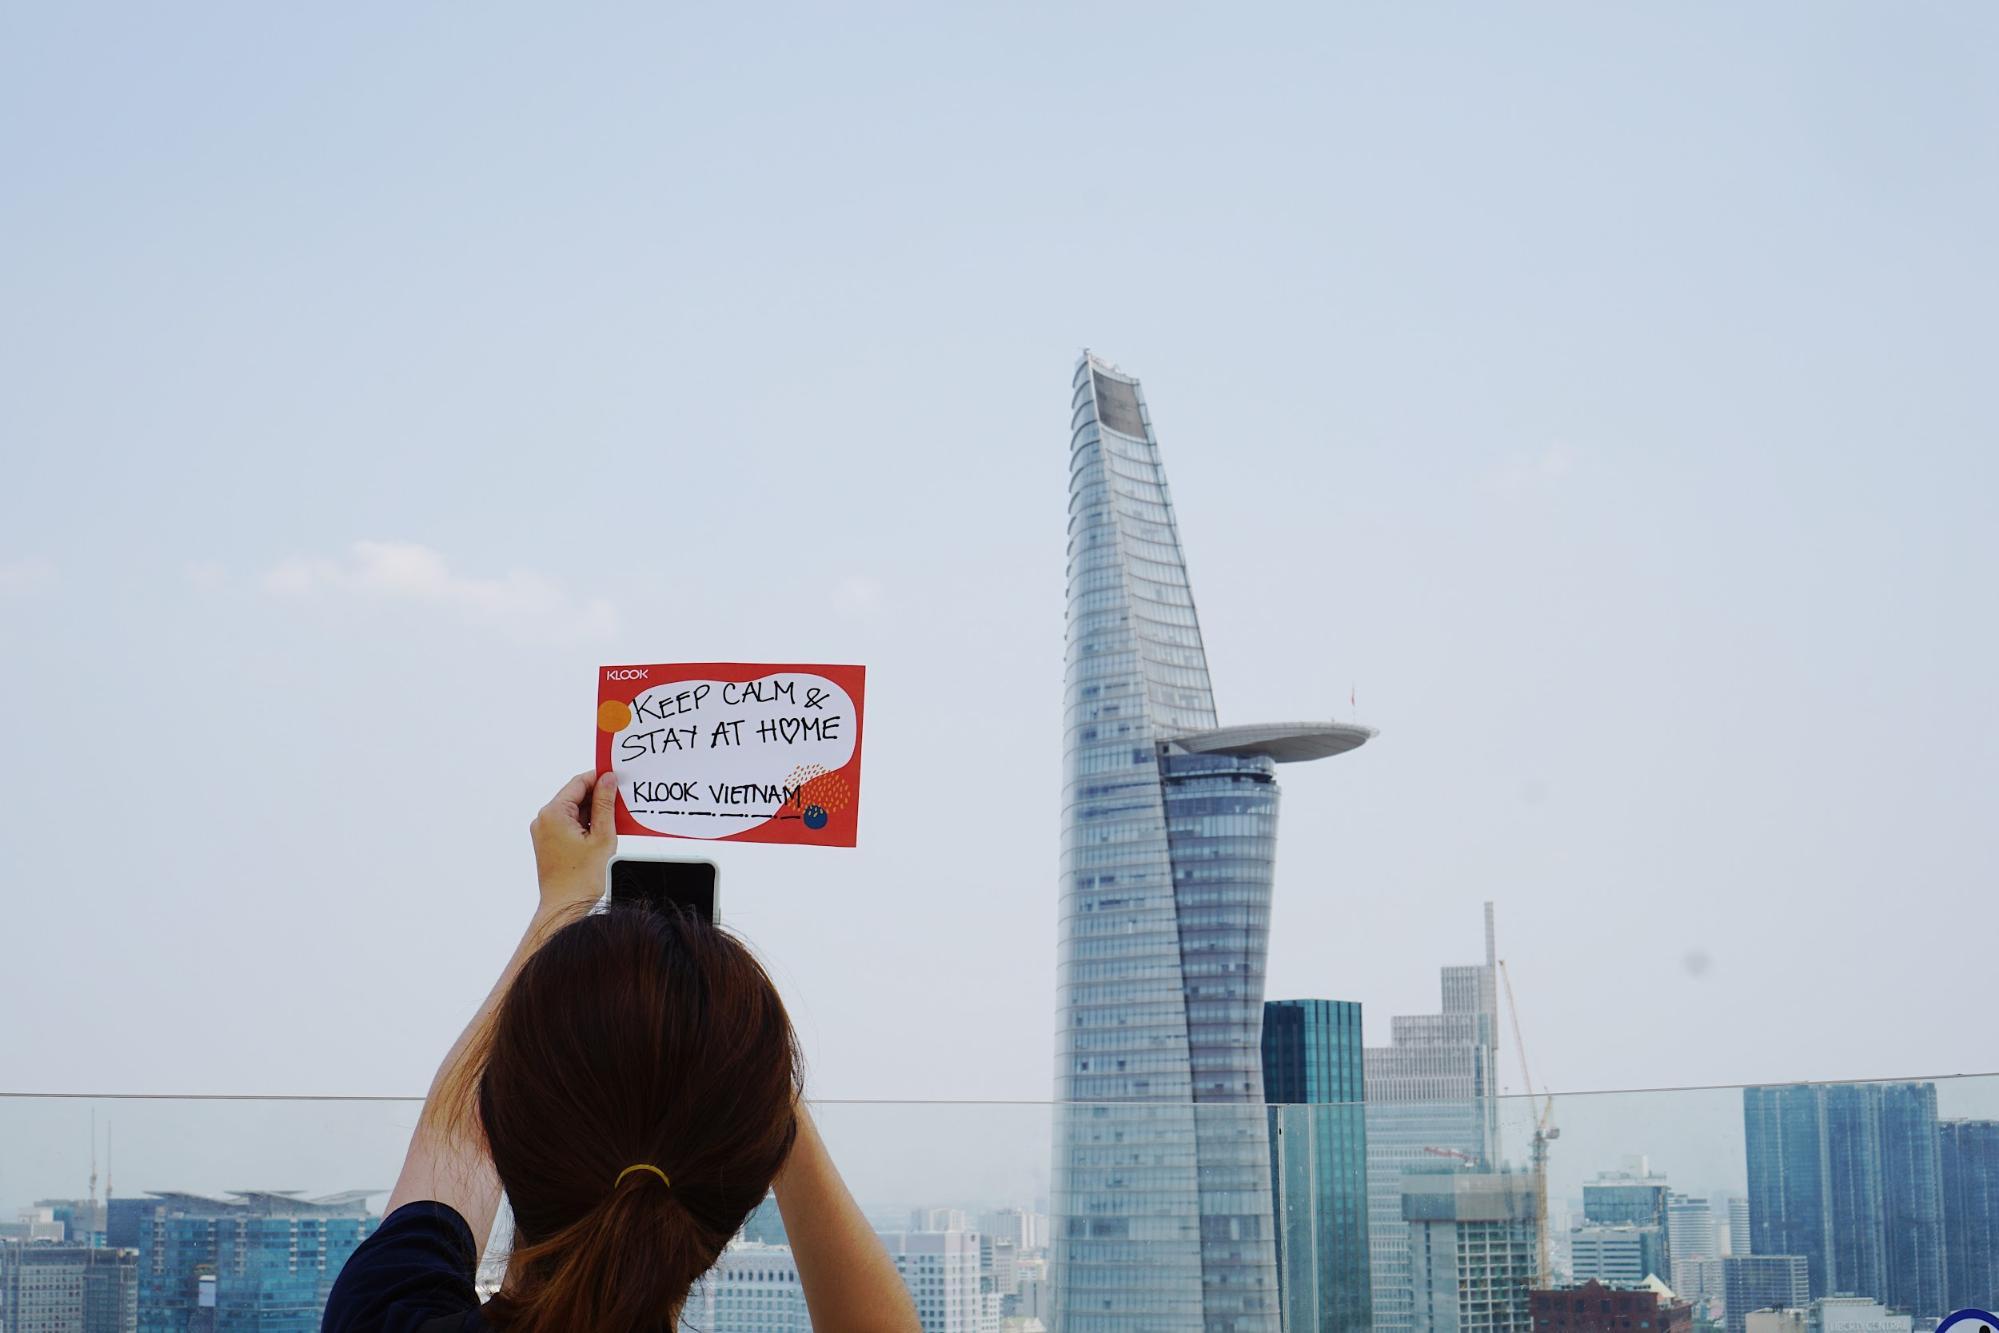 Bitexco Tower in Vietnam